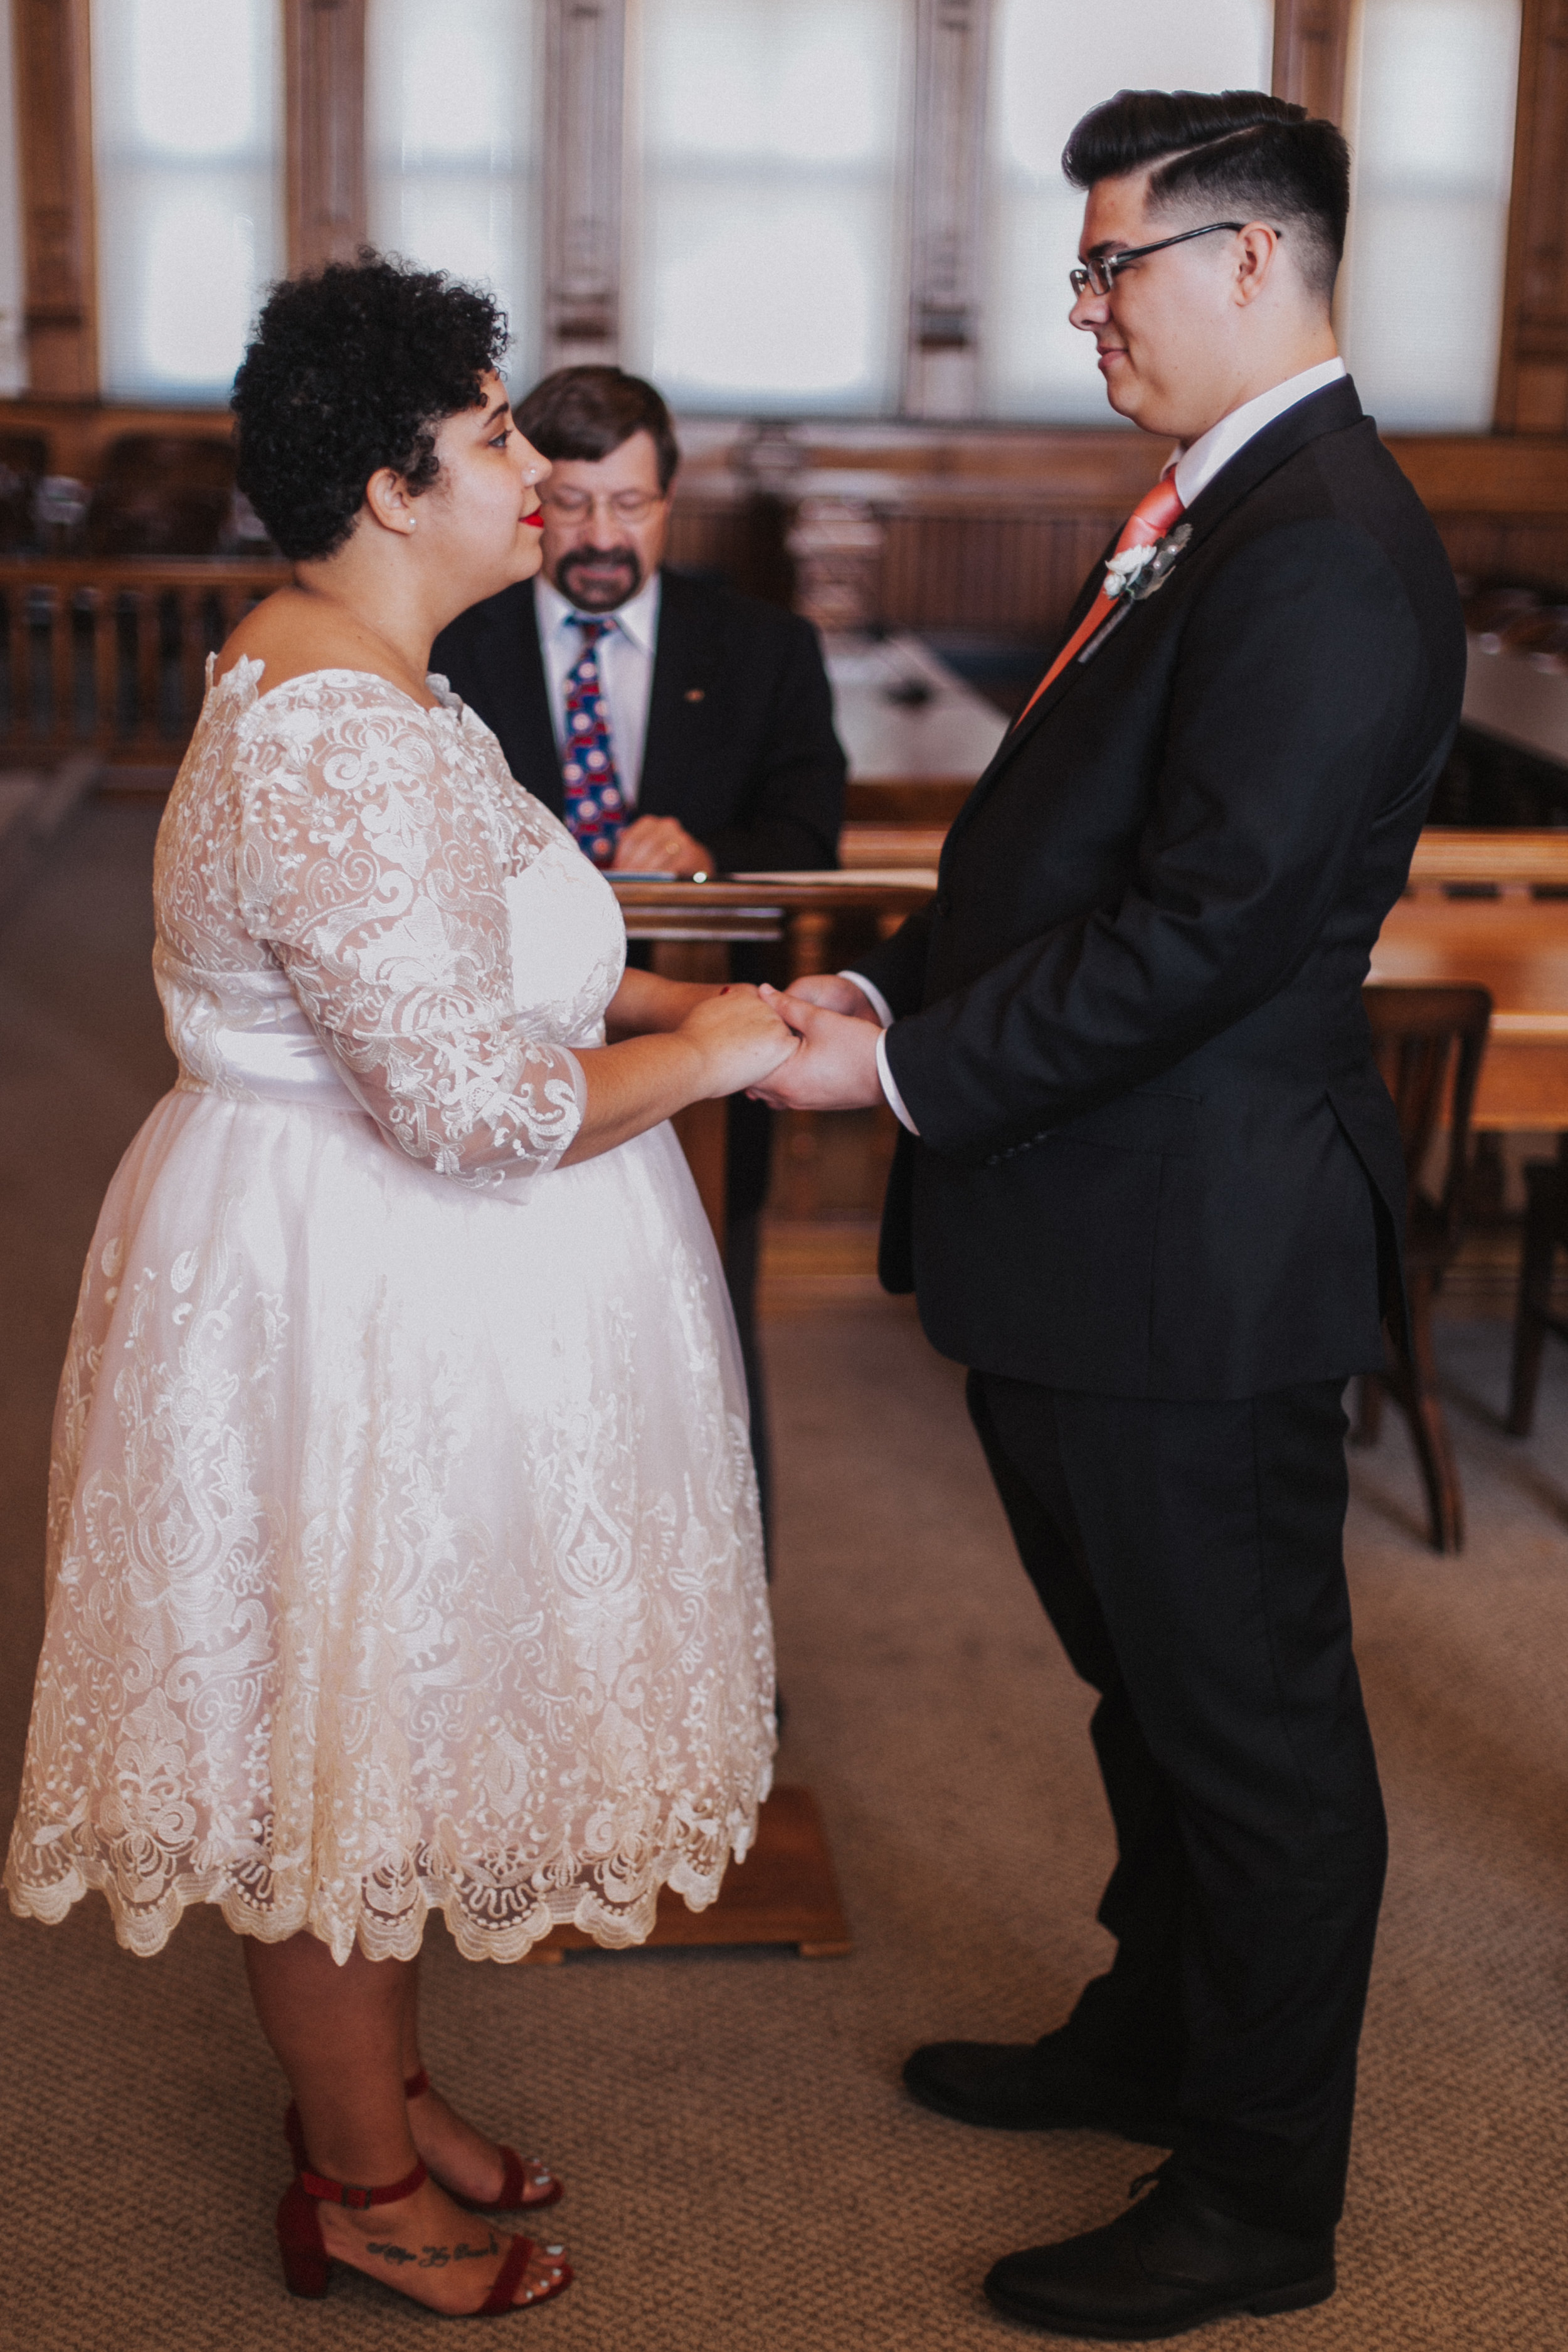 KT_Wedding-207.jpg